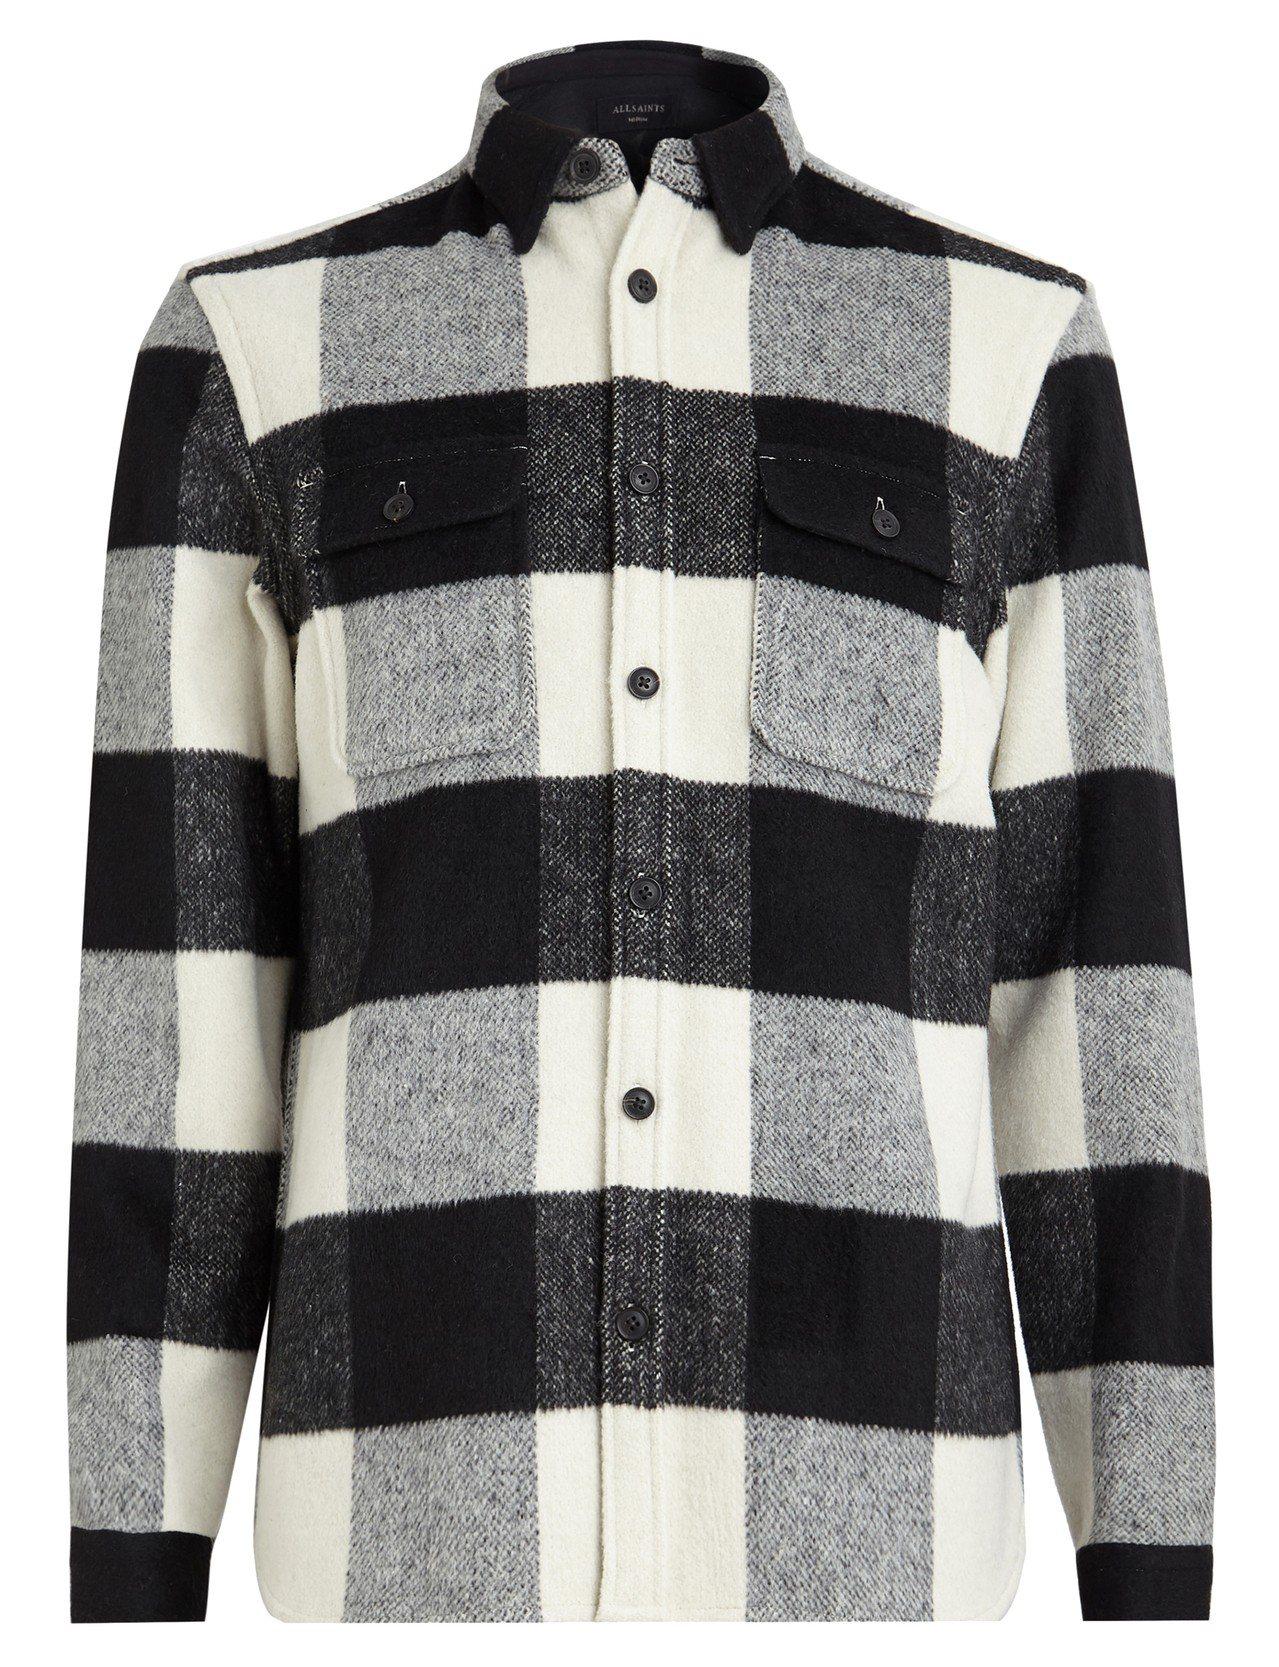 AllSaints Laona格紋襯衫,6,600元。圖/AllSaints提供